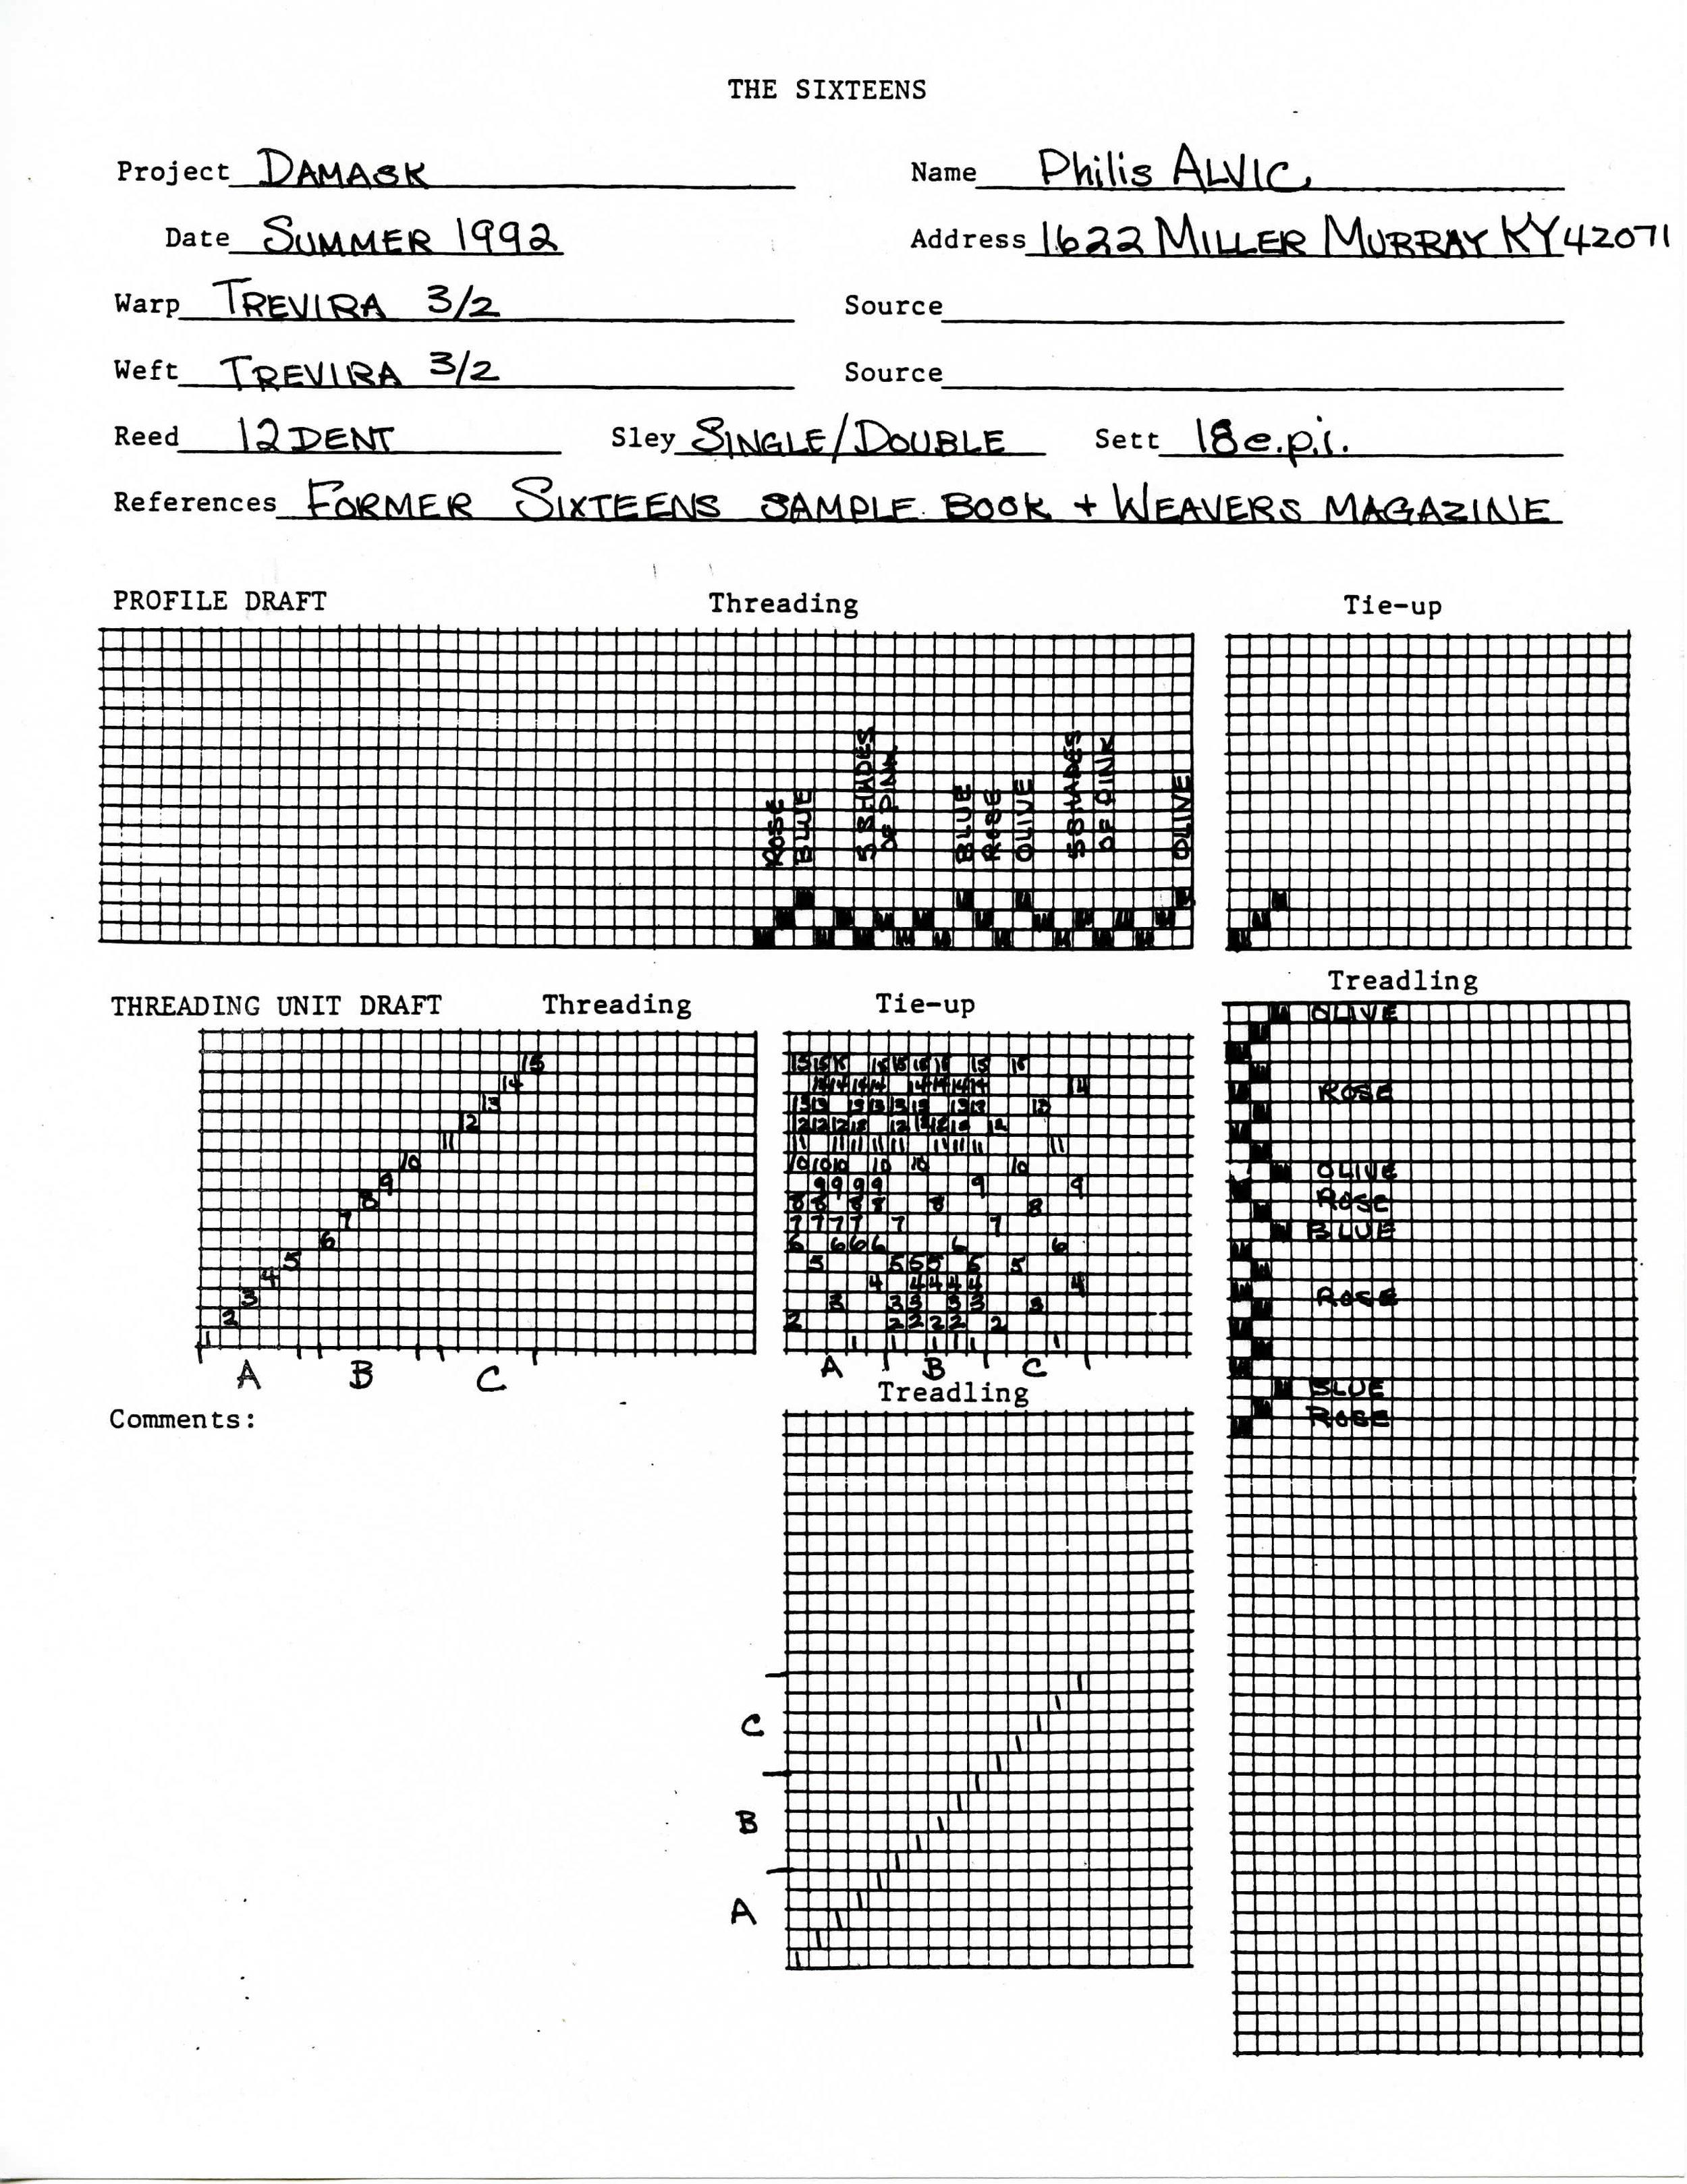 1992_Page_1_Image_0001.jpg